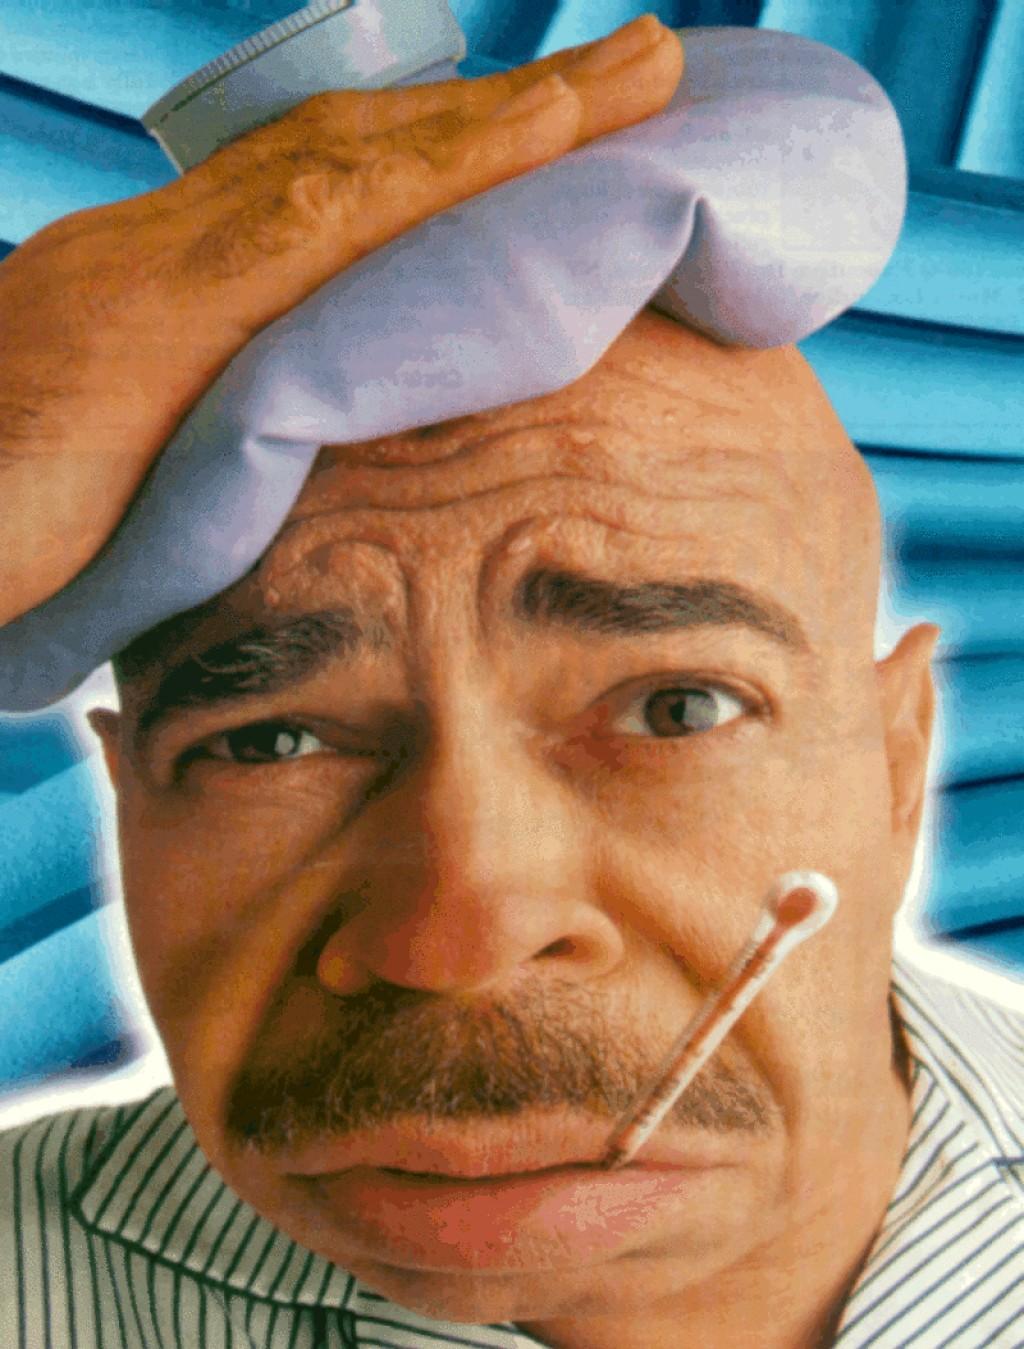 phentermine headaches - do they go away